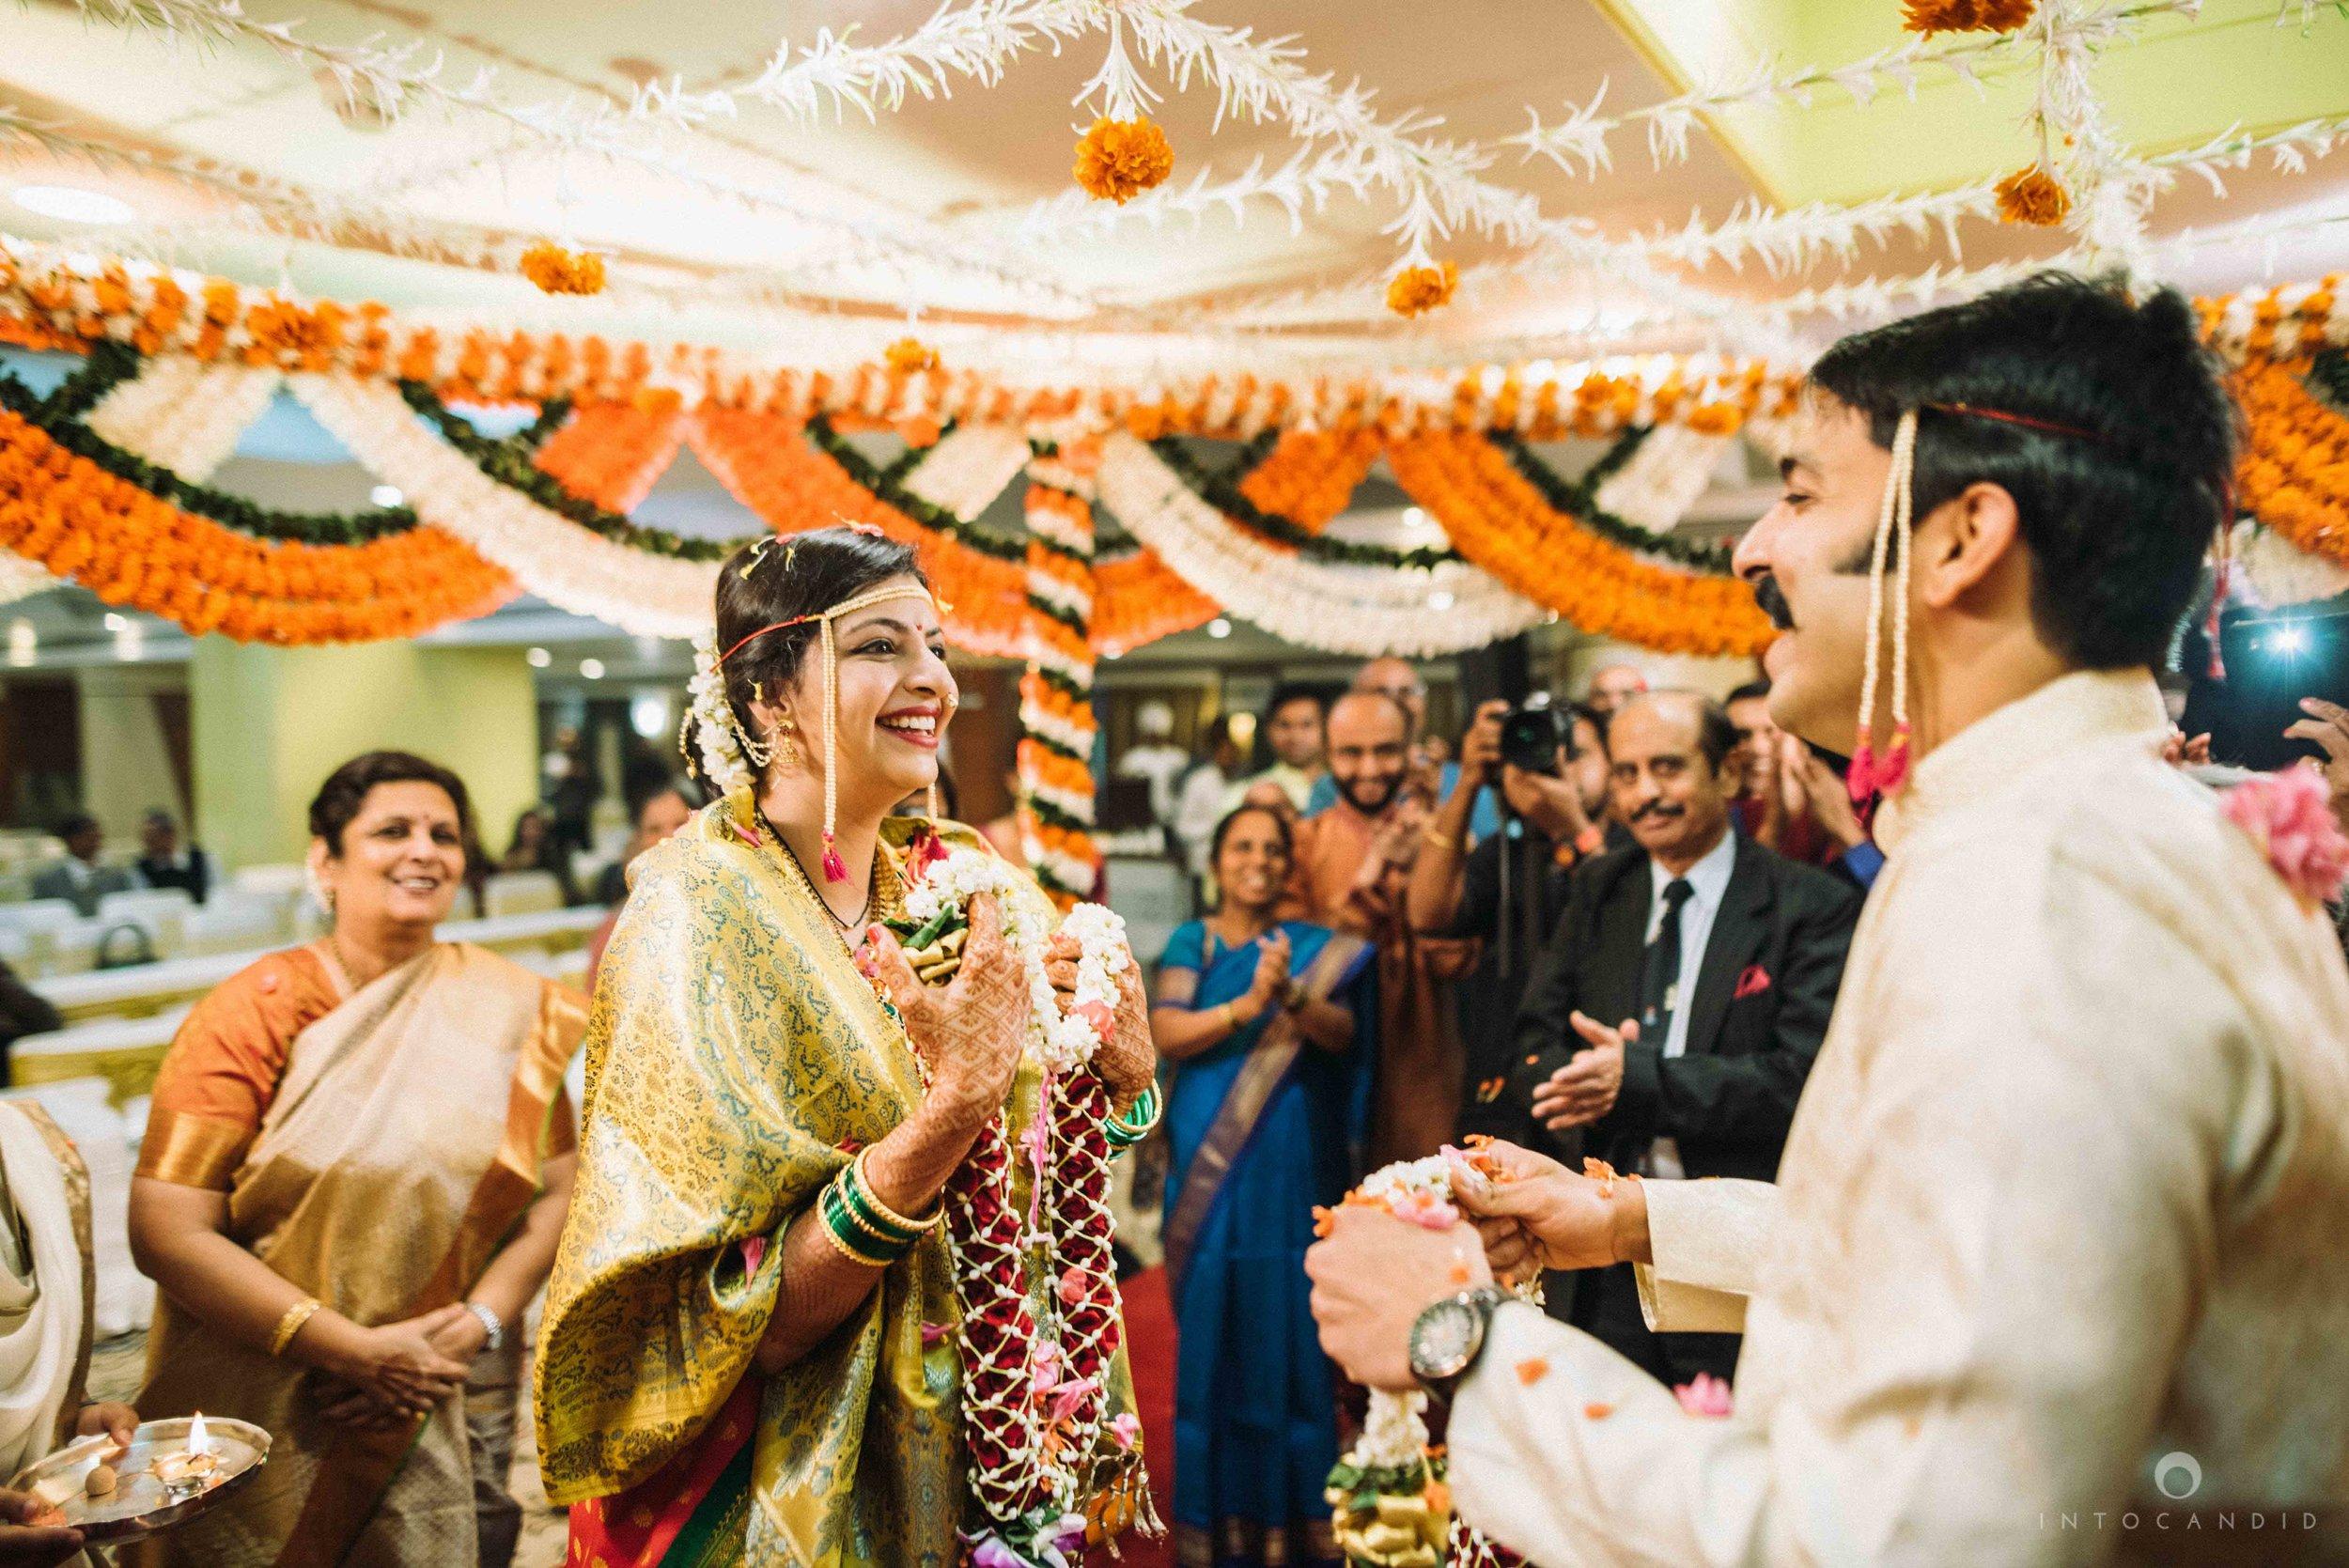 Bangalore_Wedding_Photographer_Indian_Wedding_Photography_76.jpg